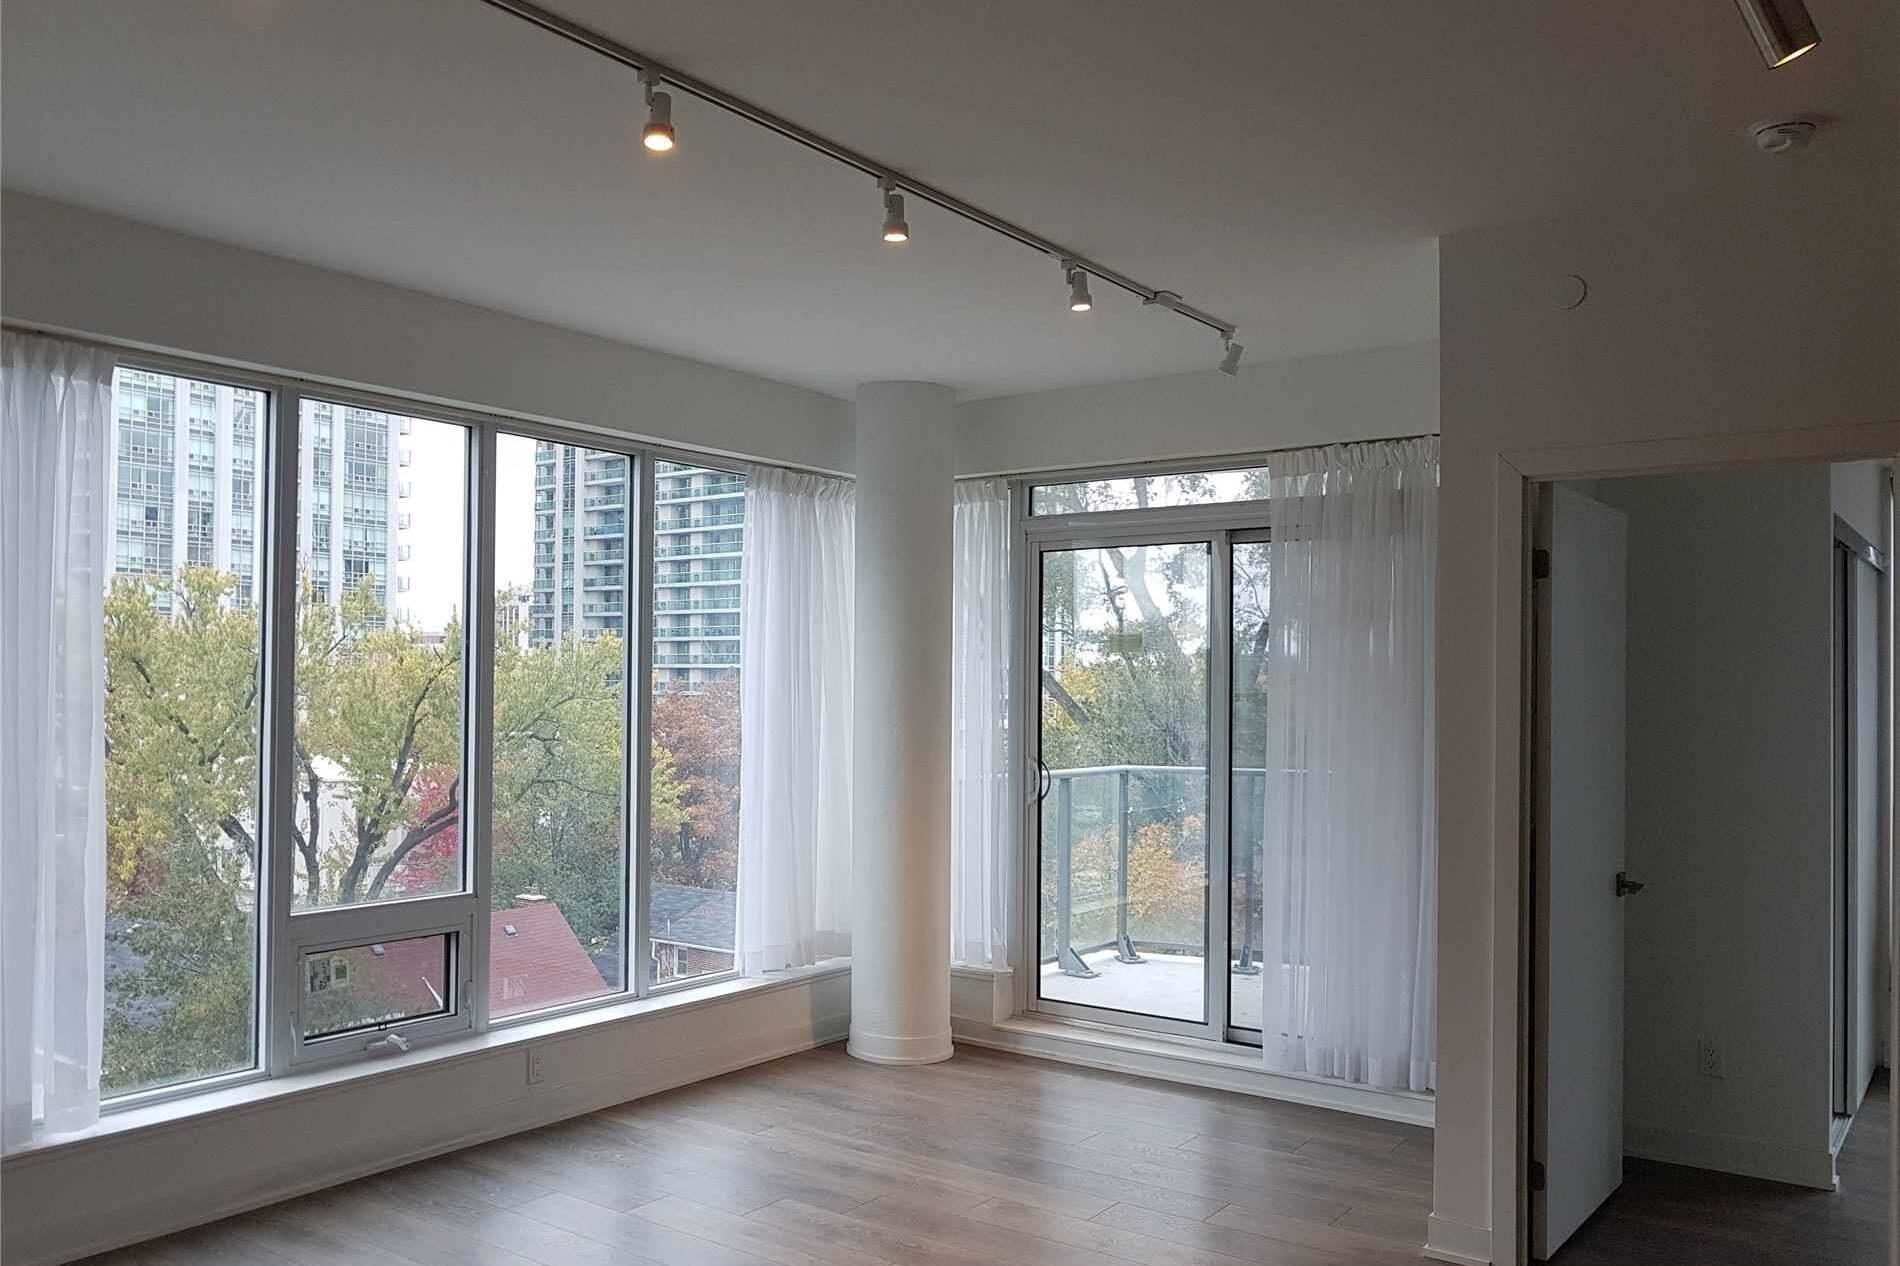 Flo Condos Condos: 28 Avondale Avenue, Toronto, ON